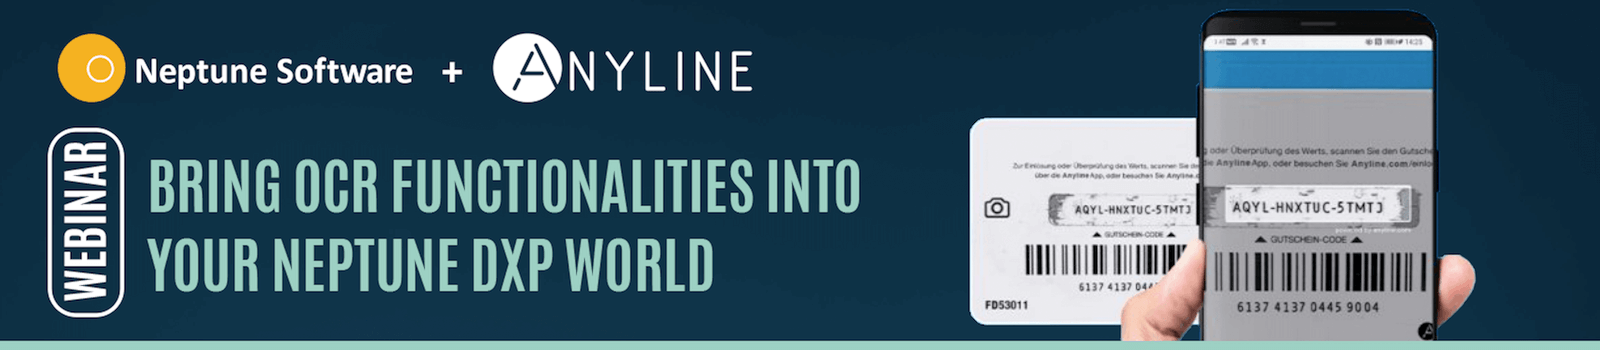 Webinar Anyline